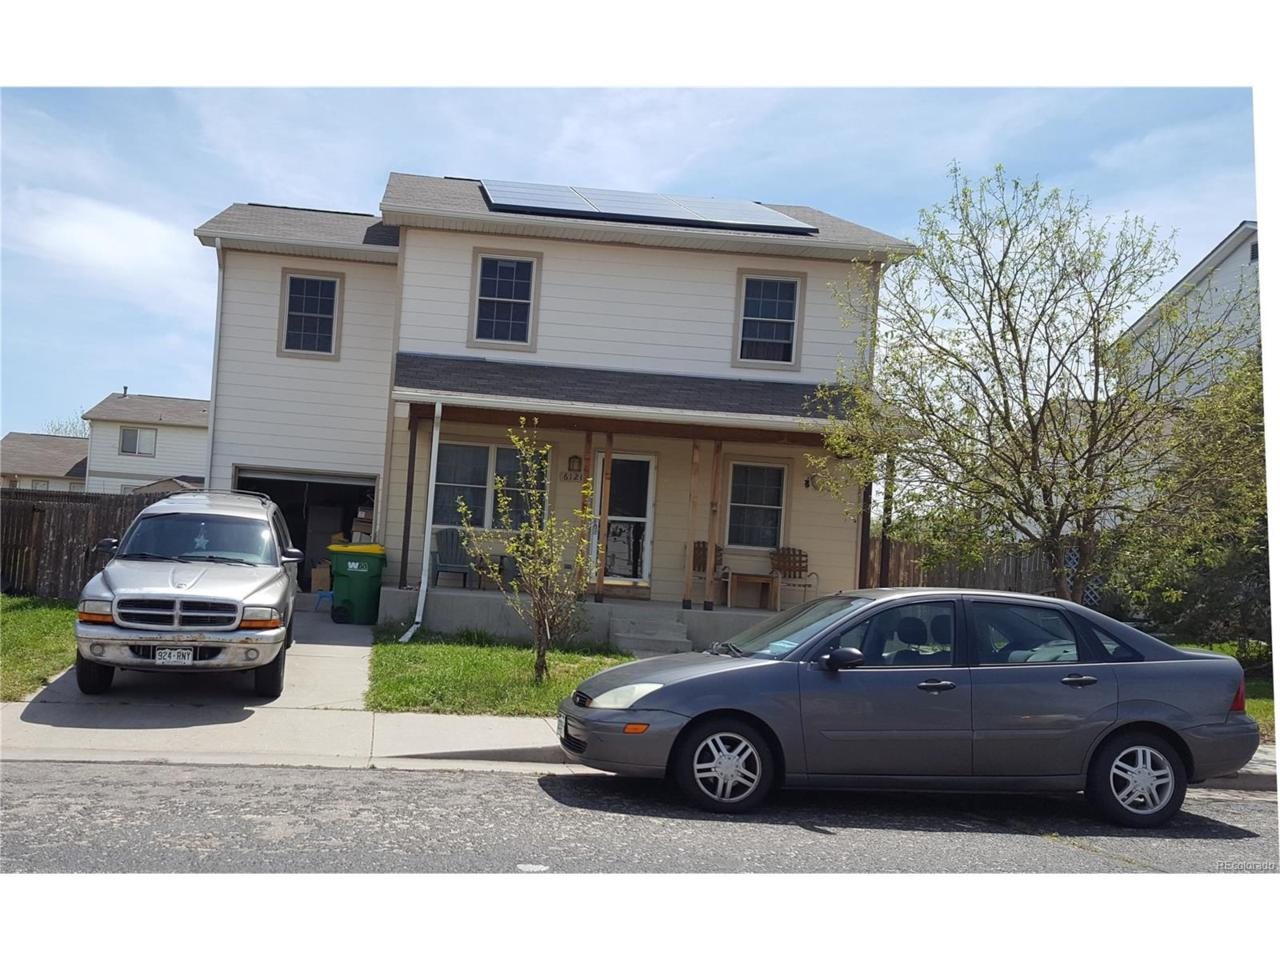 6120 Pontiac Street, Commerce City, CO 80022 (MLS #1876684) :: 8z Real Estate